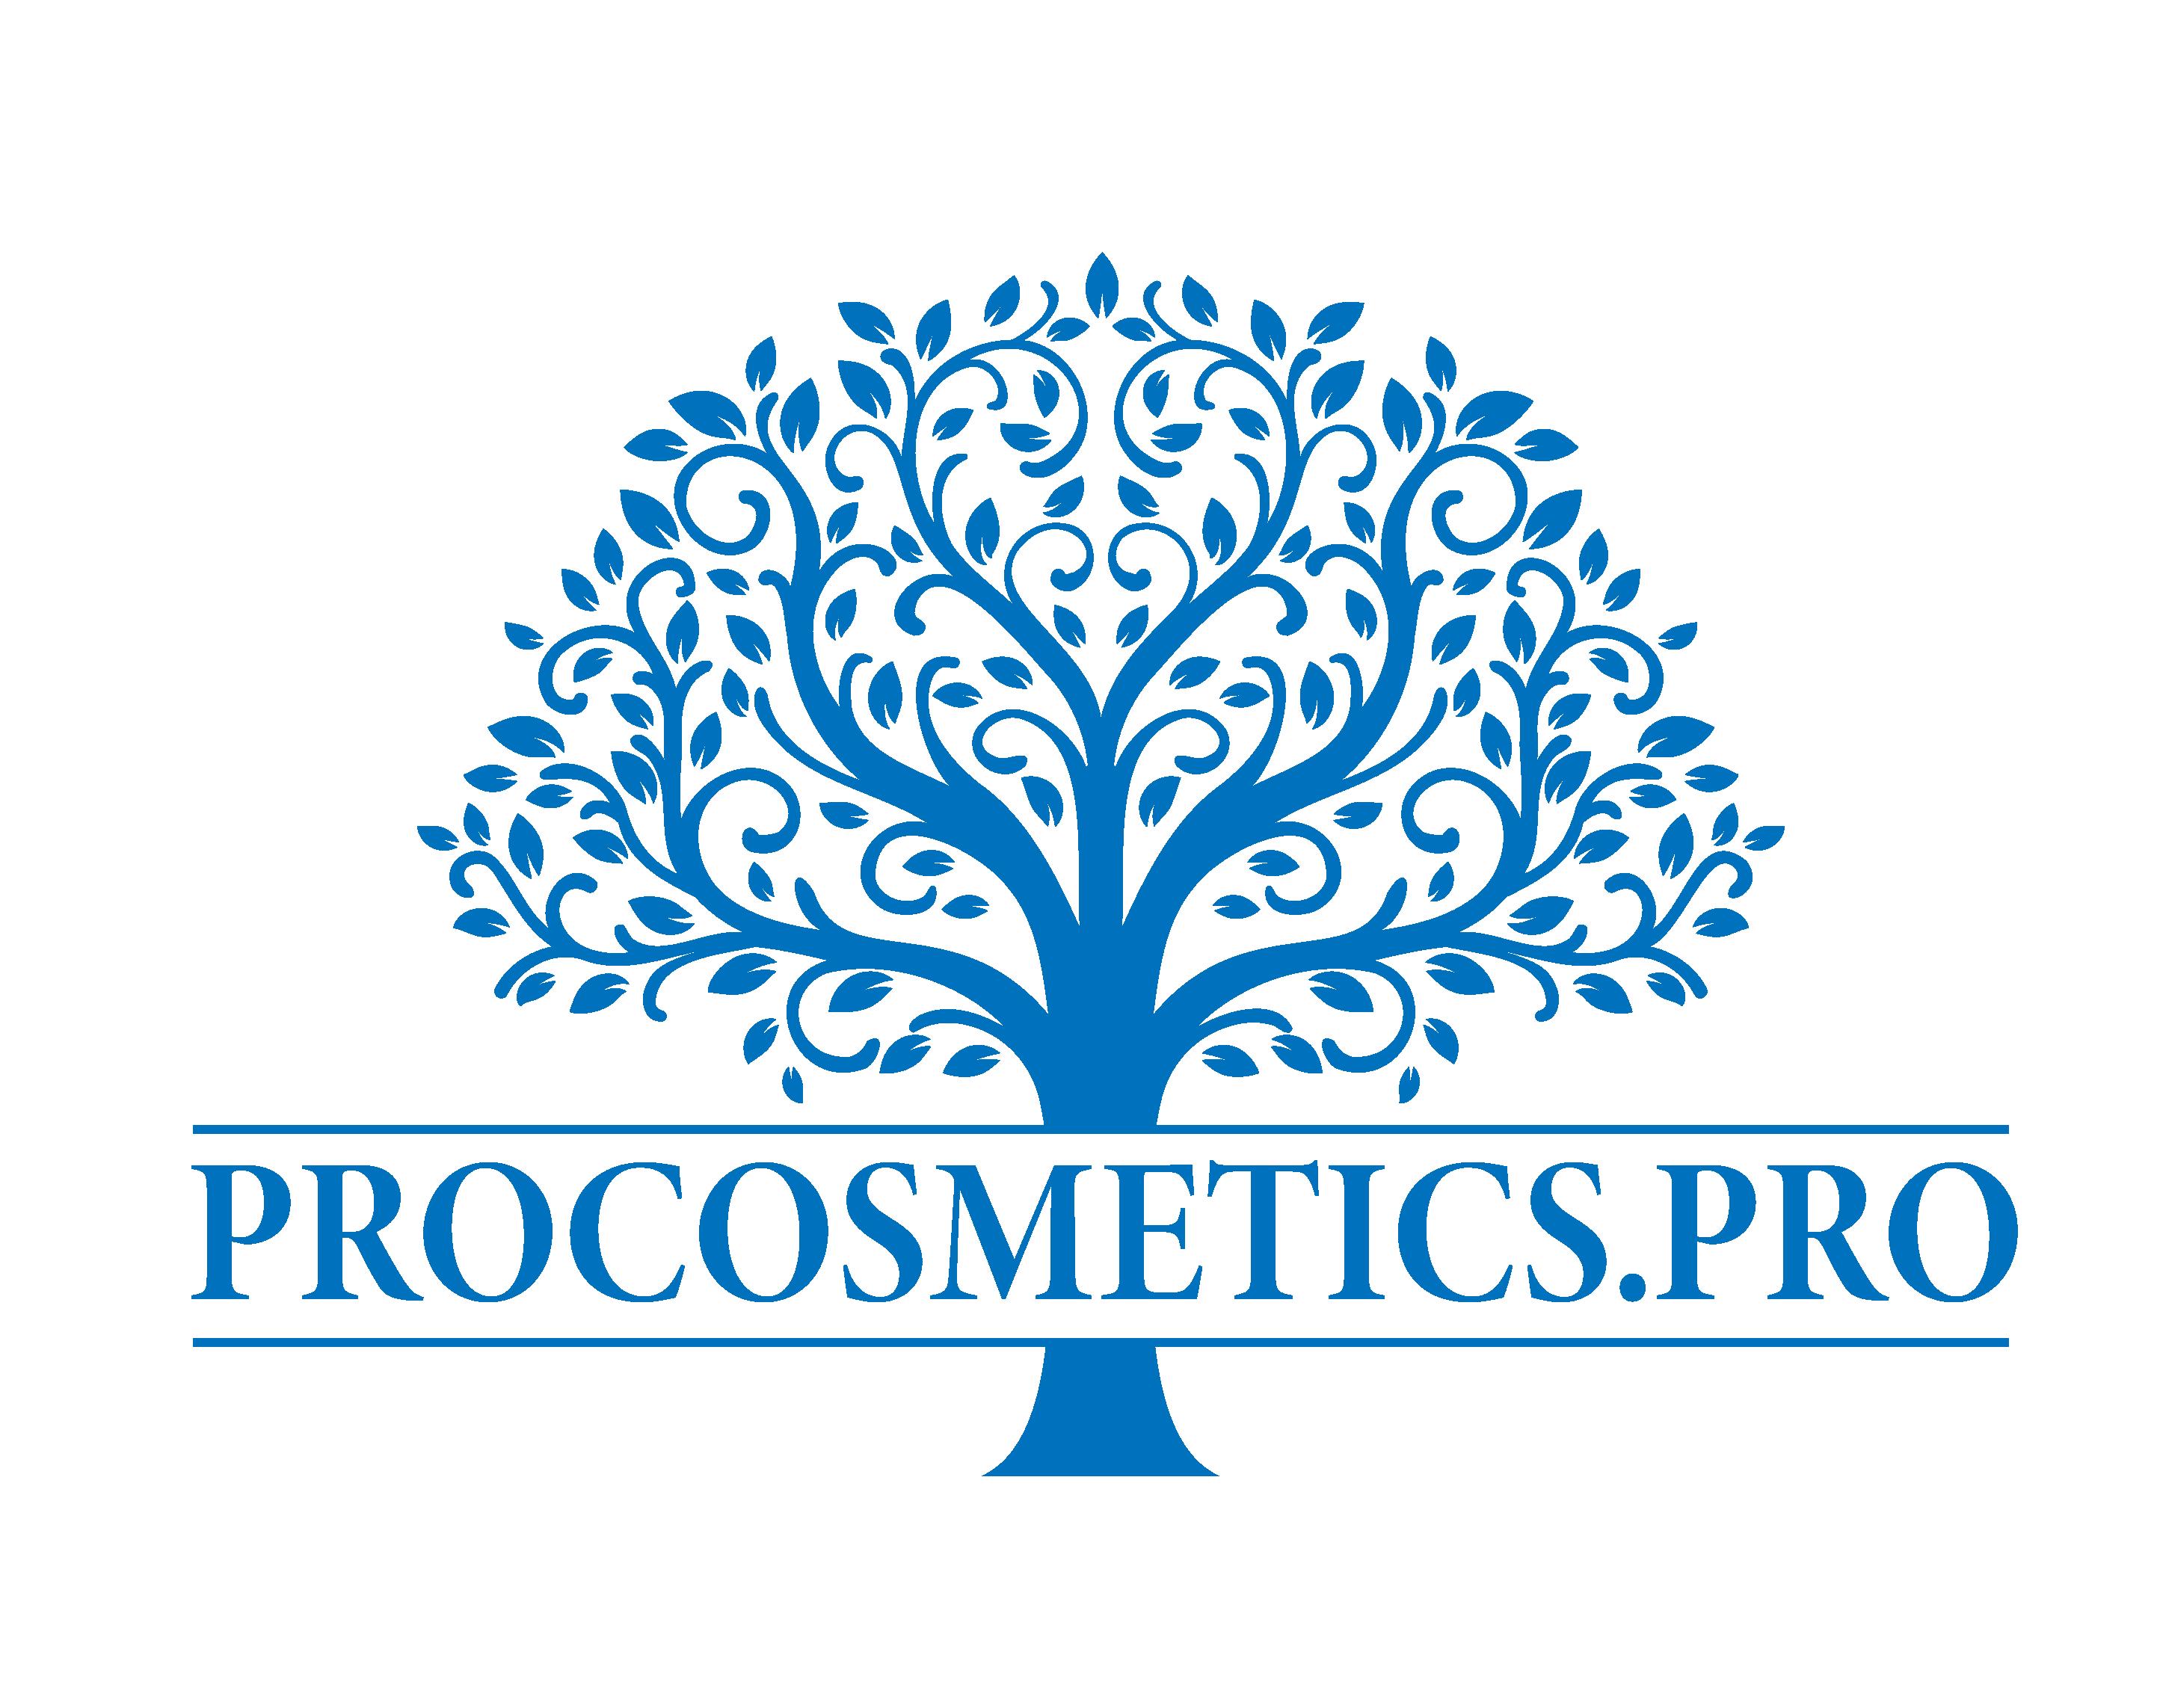 procosmetics.pro